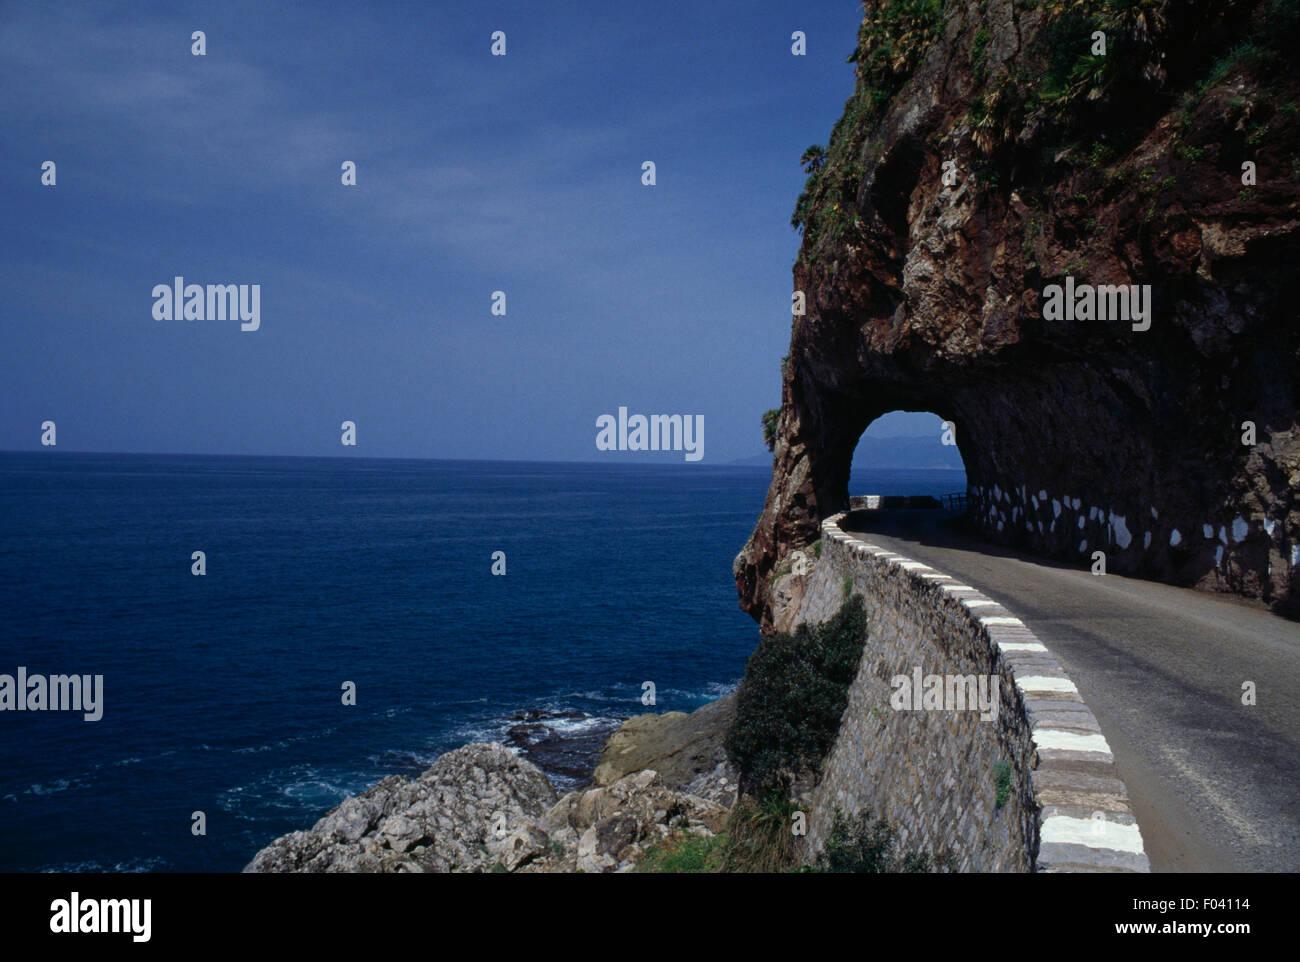 Rock-cut tunnel, coastal road, Bejaia, Algeria. Stock Photo